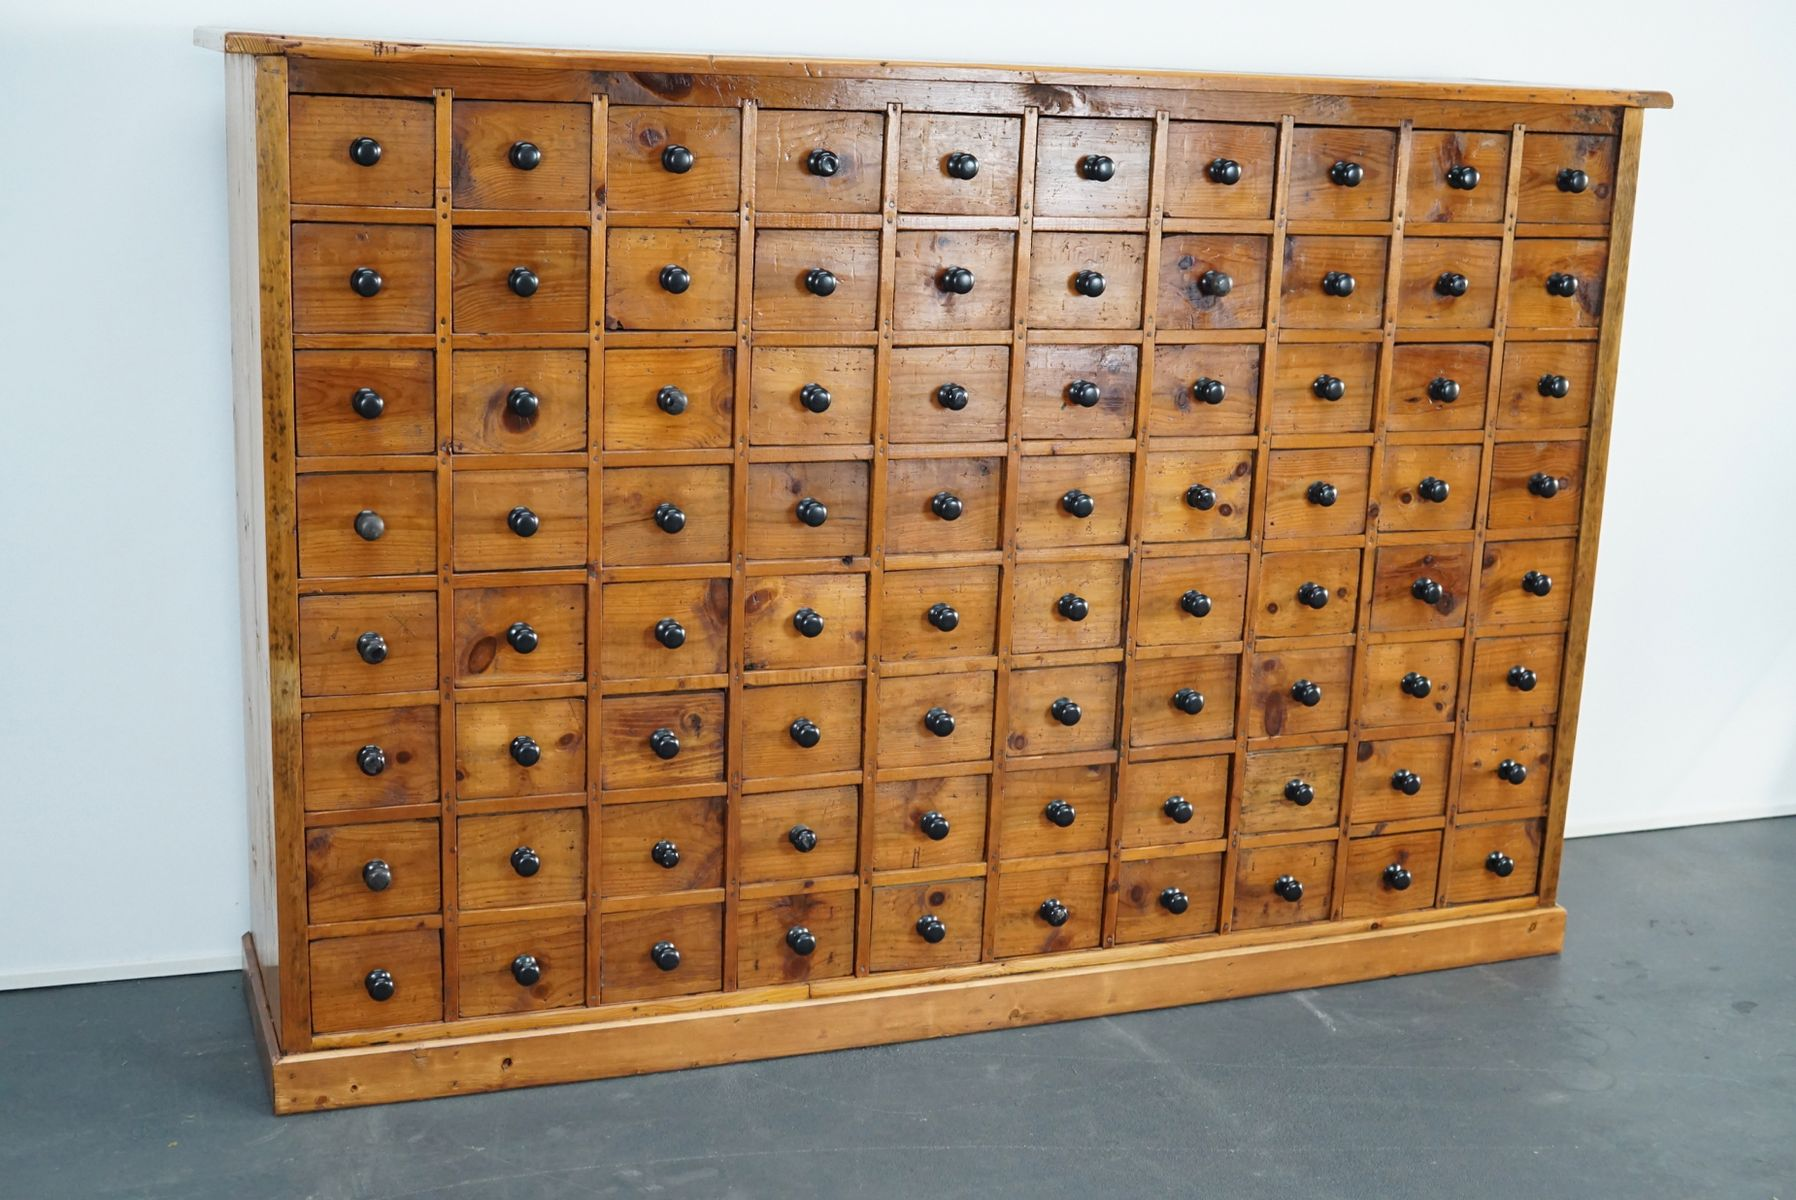 armoire d apothicaire ou meuble a tiroirs en pin pays bas 1940s